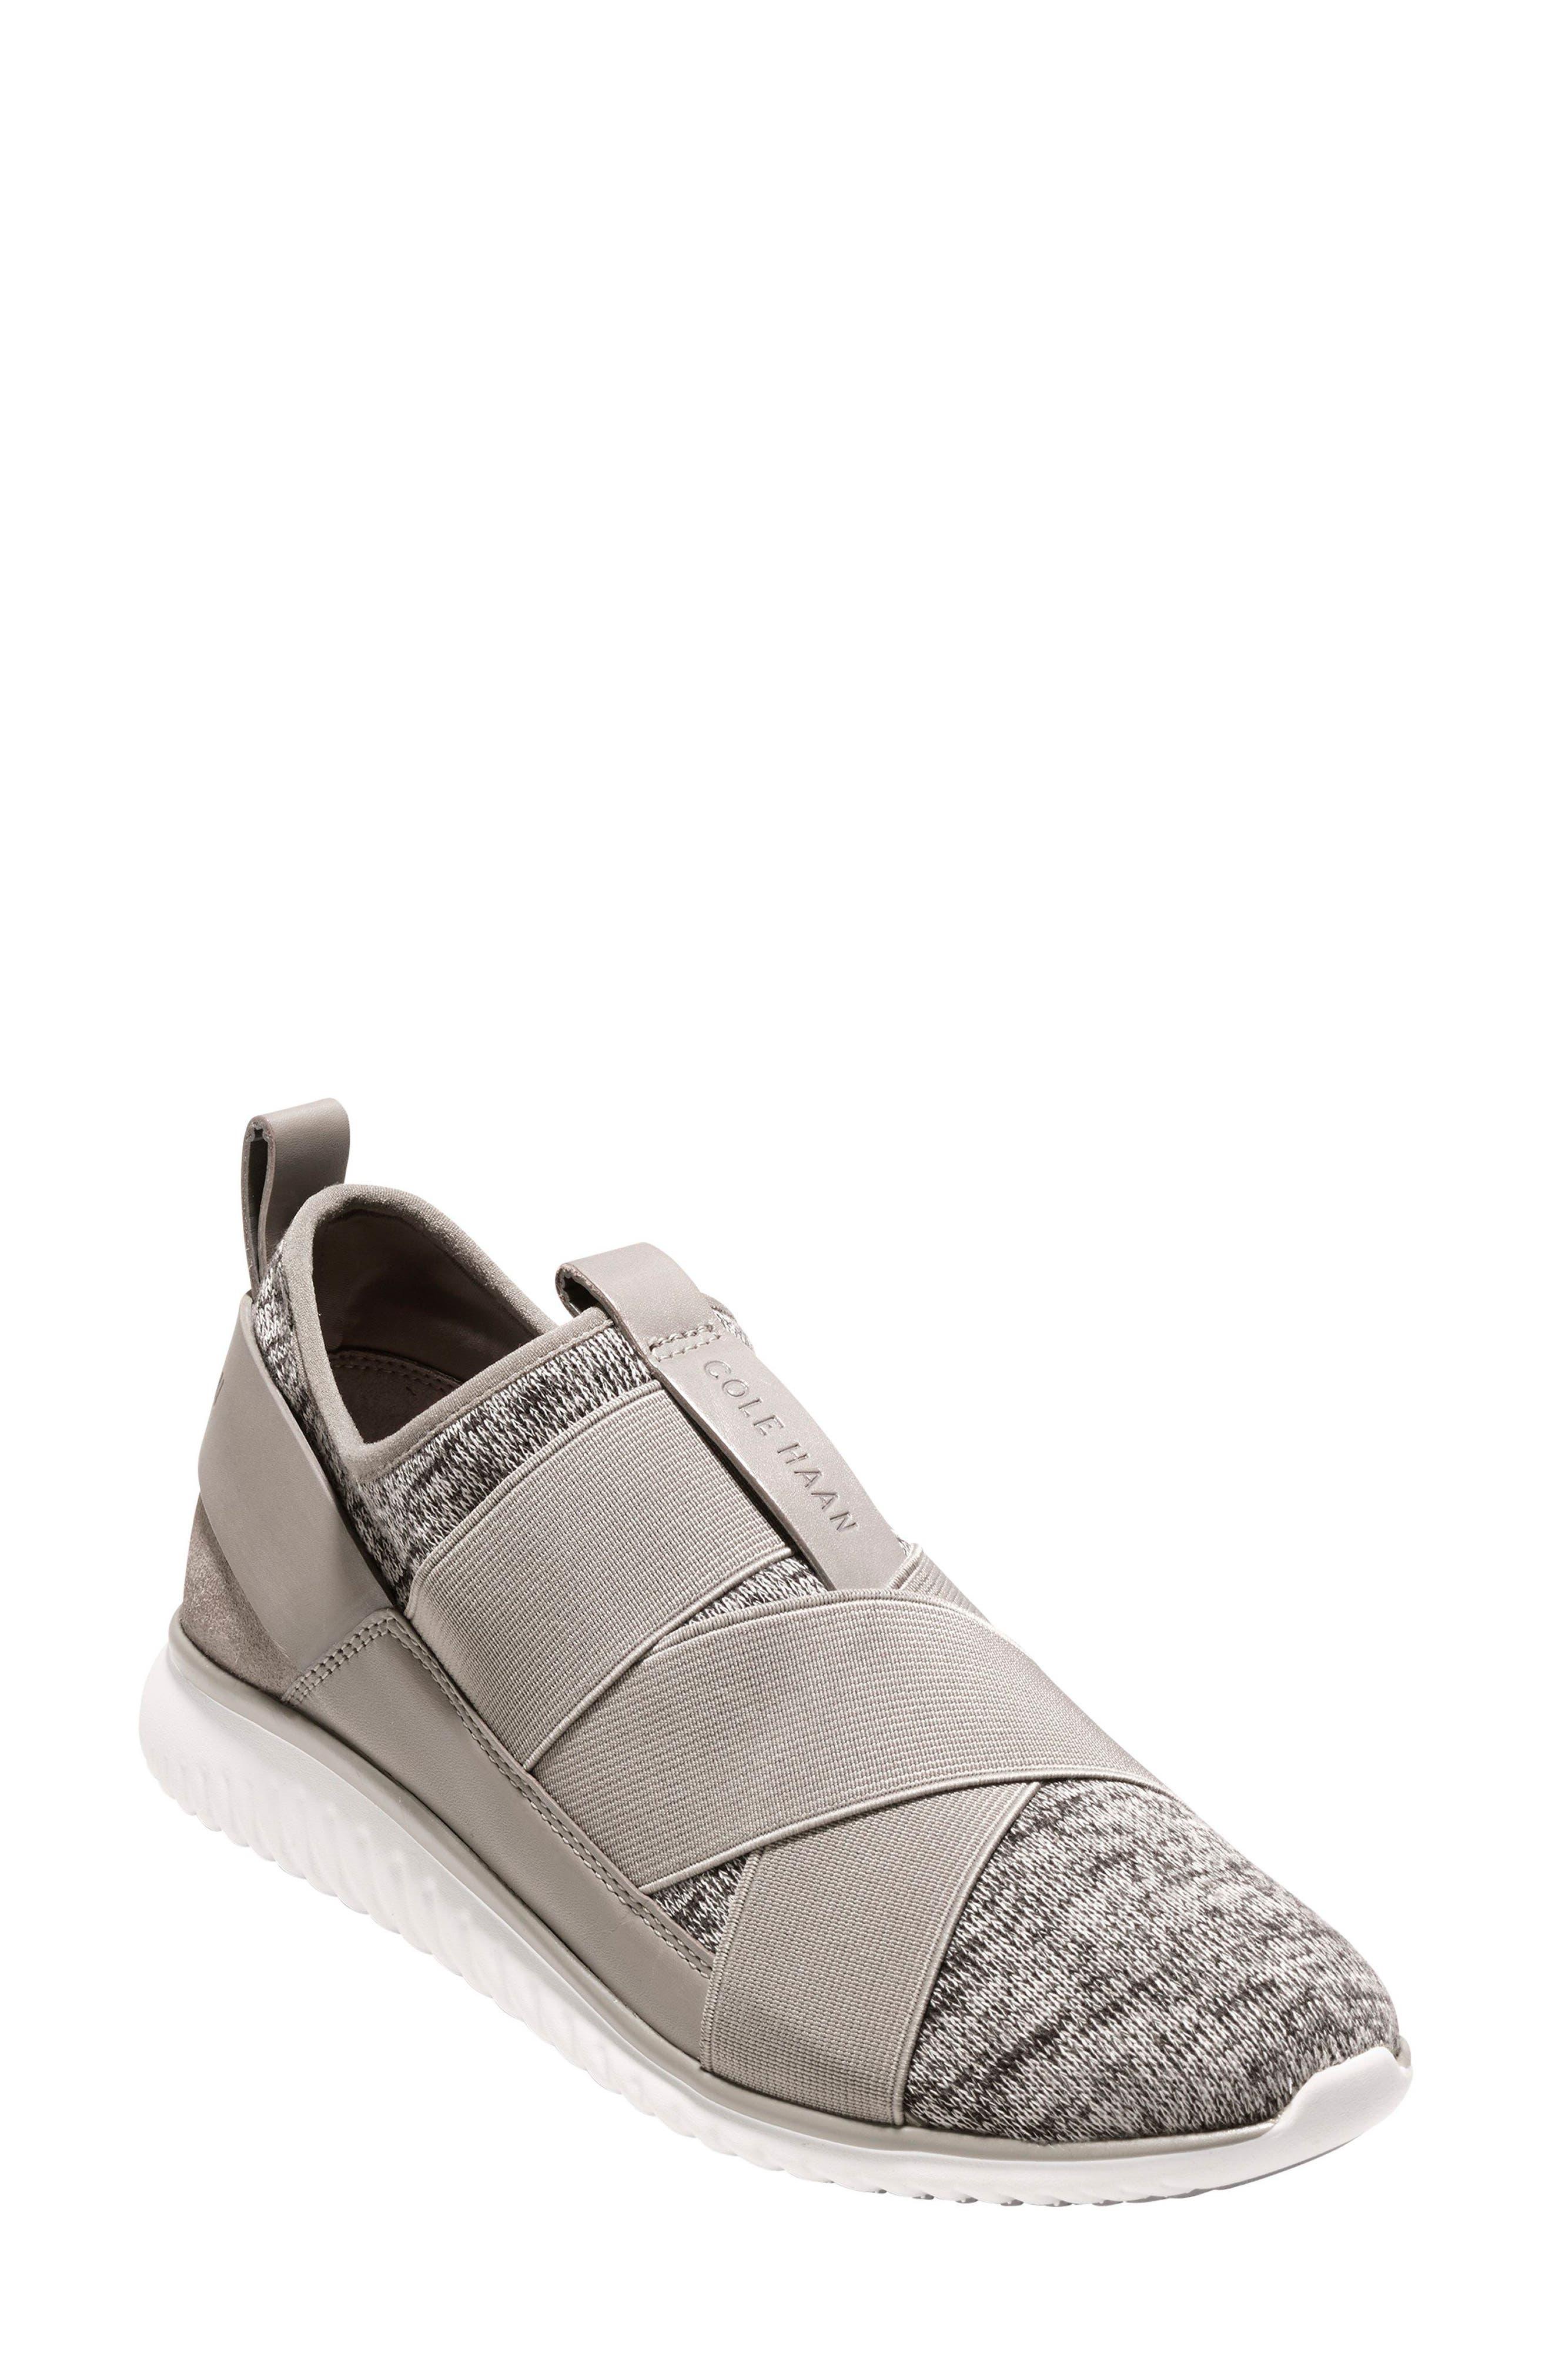 'StudioGrand' Sneaker,                             Main thumbnail 2, color,